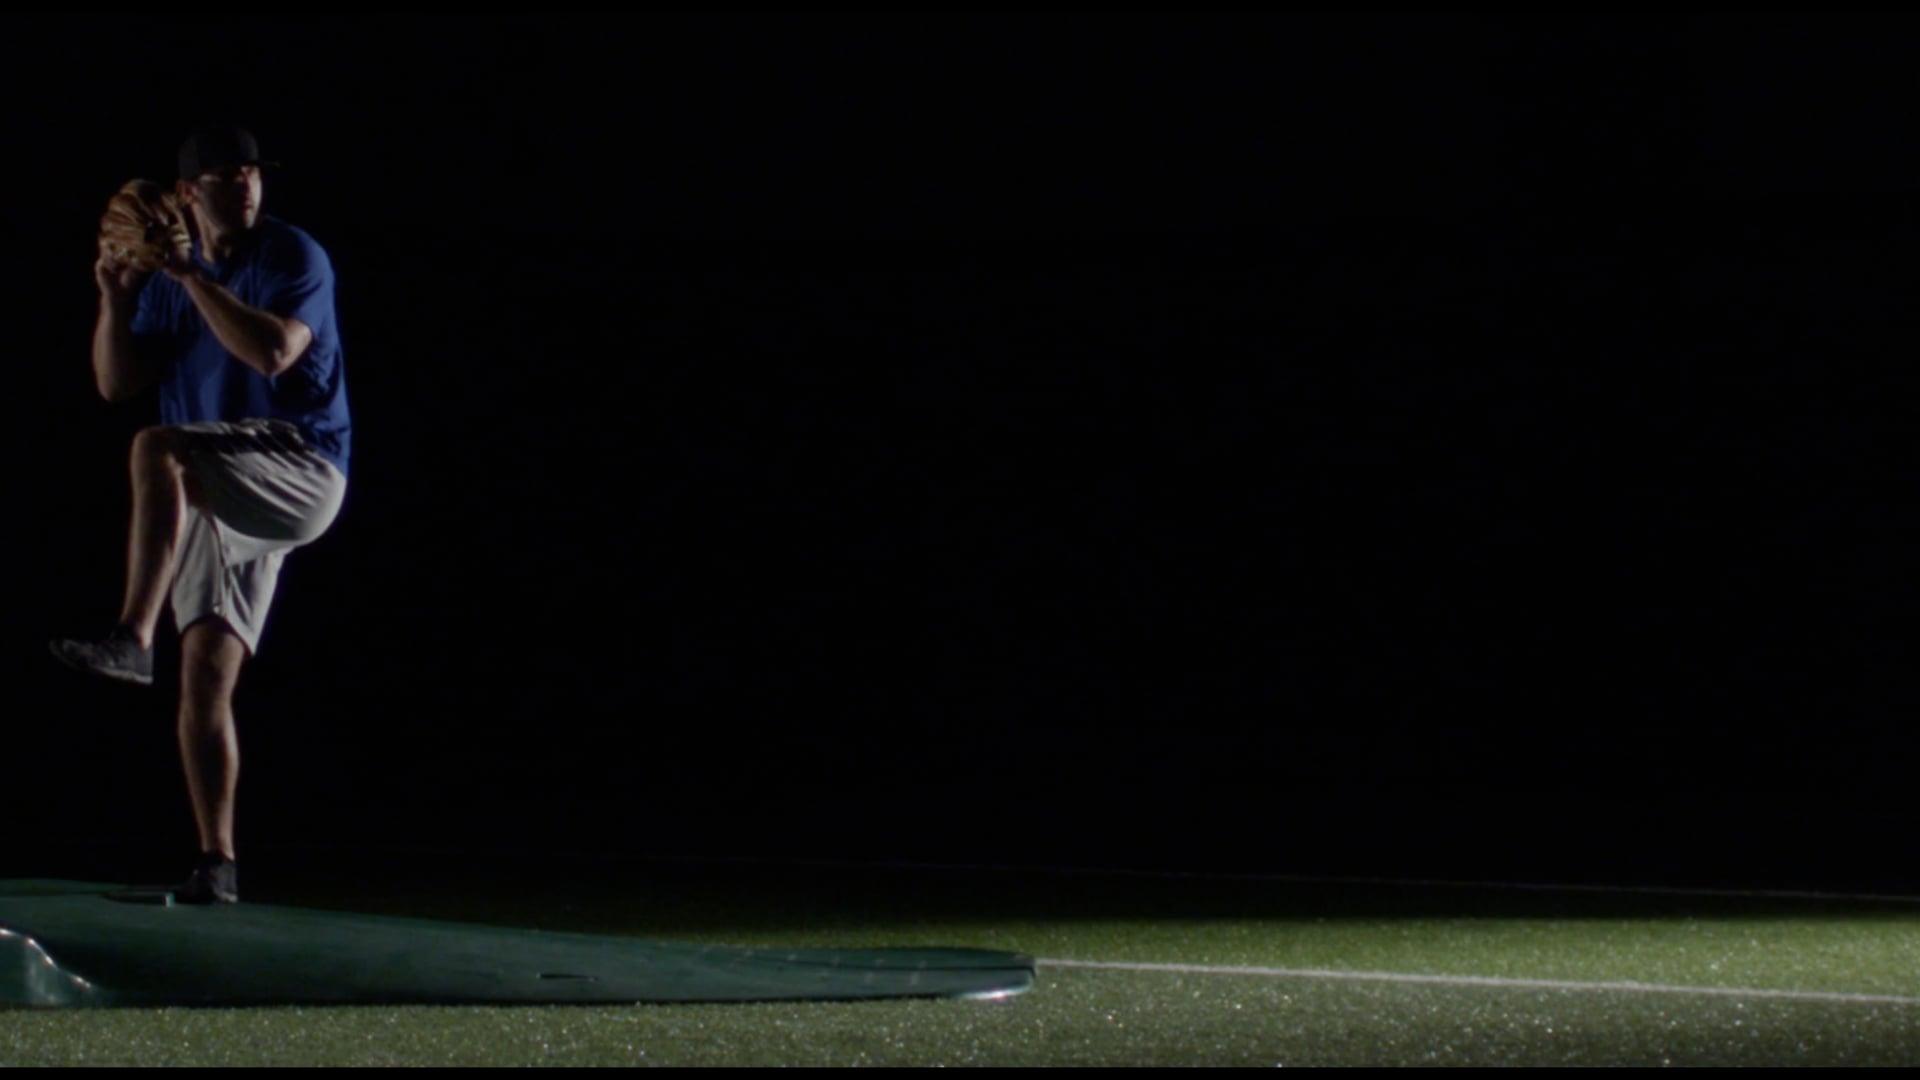 Driveline Baseball - Hacking the Kinetic Chain